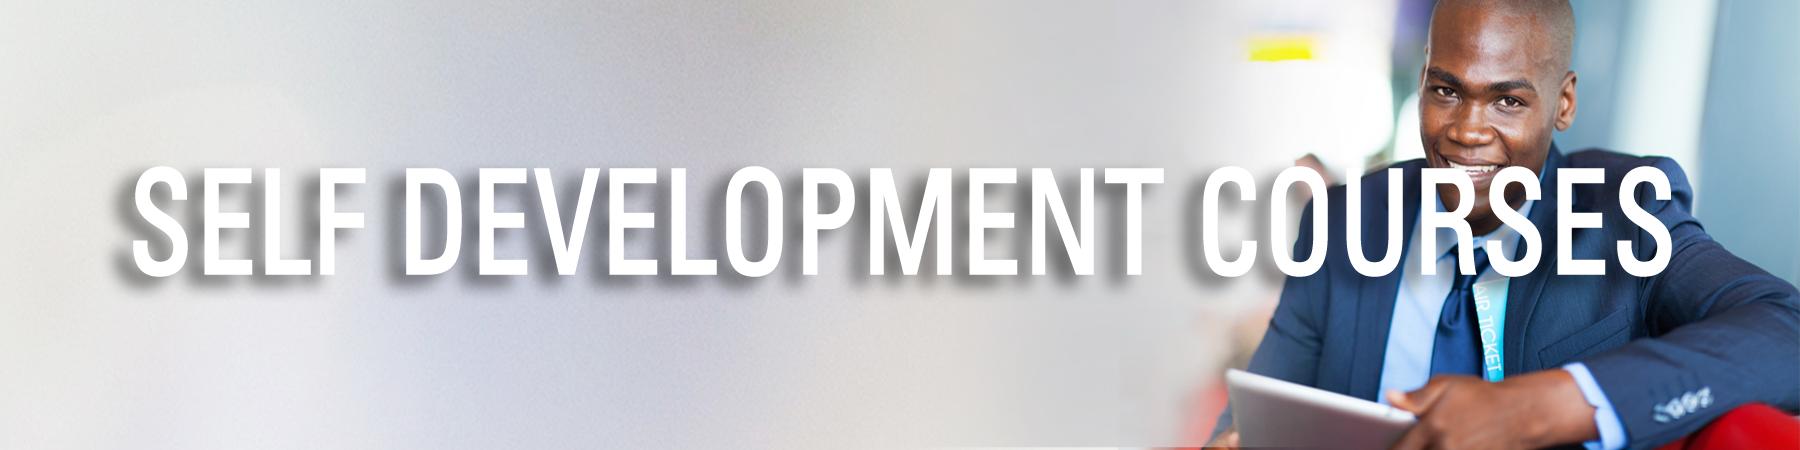 self development courses